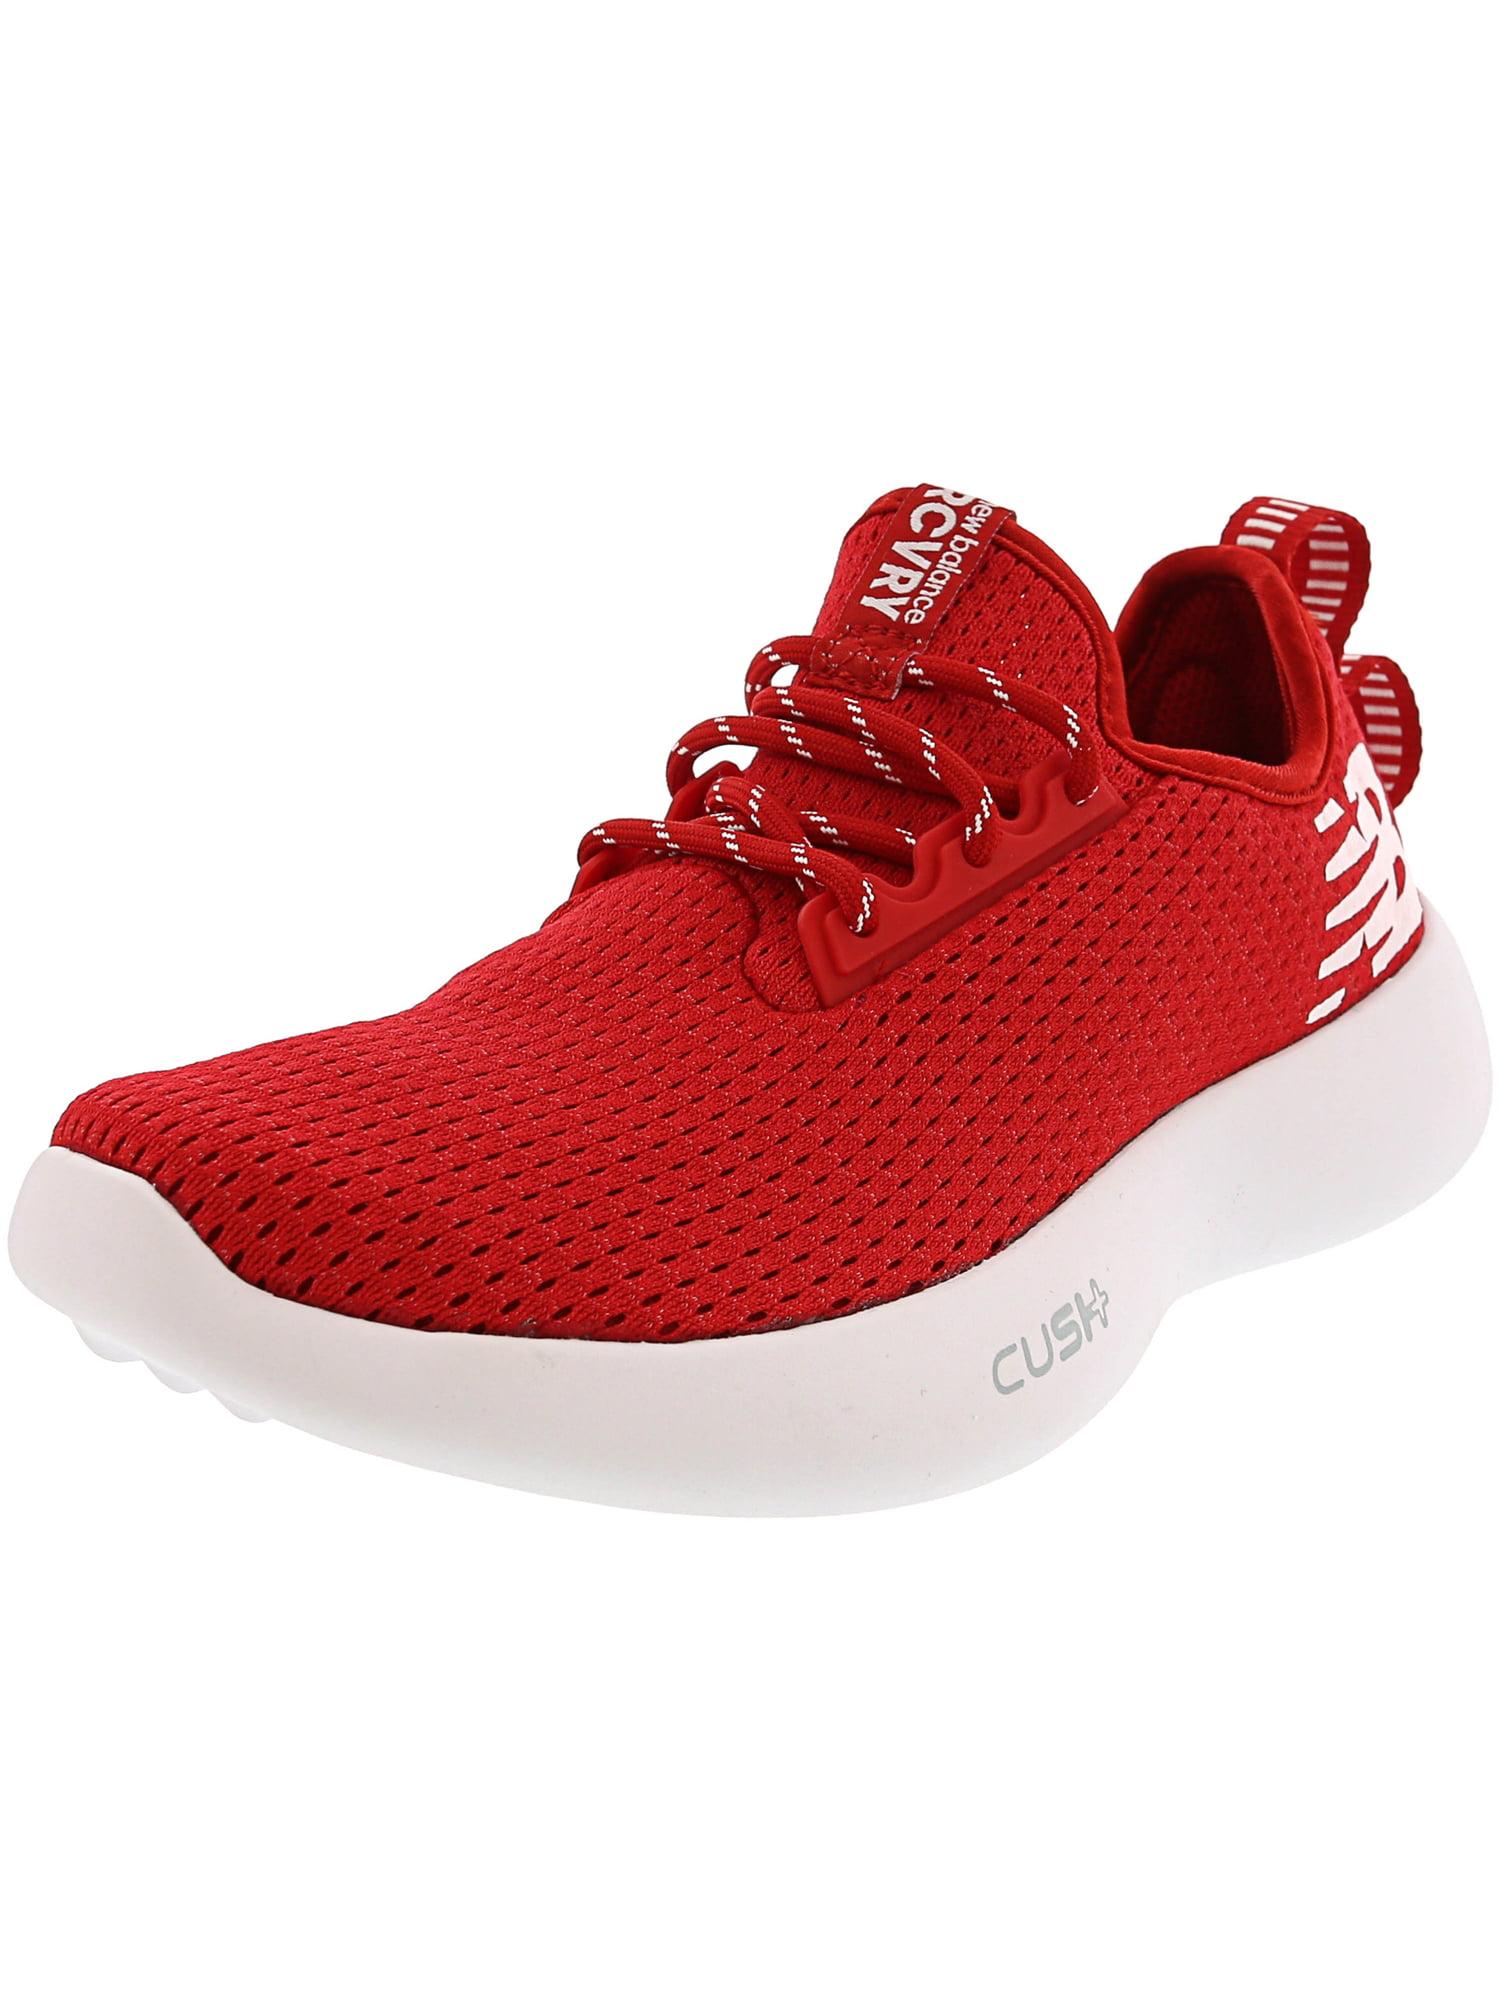 New Balance Men's Rcvry Rd Ankle-High Fashion Sneaker - 4.5M